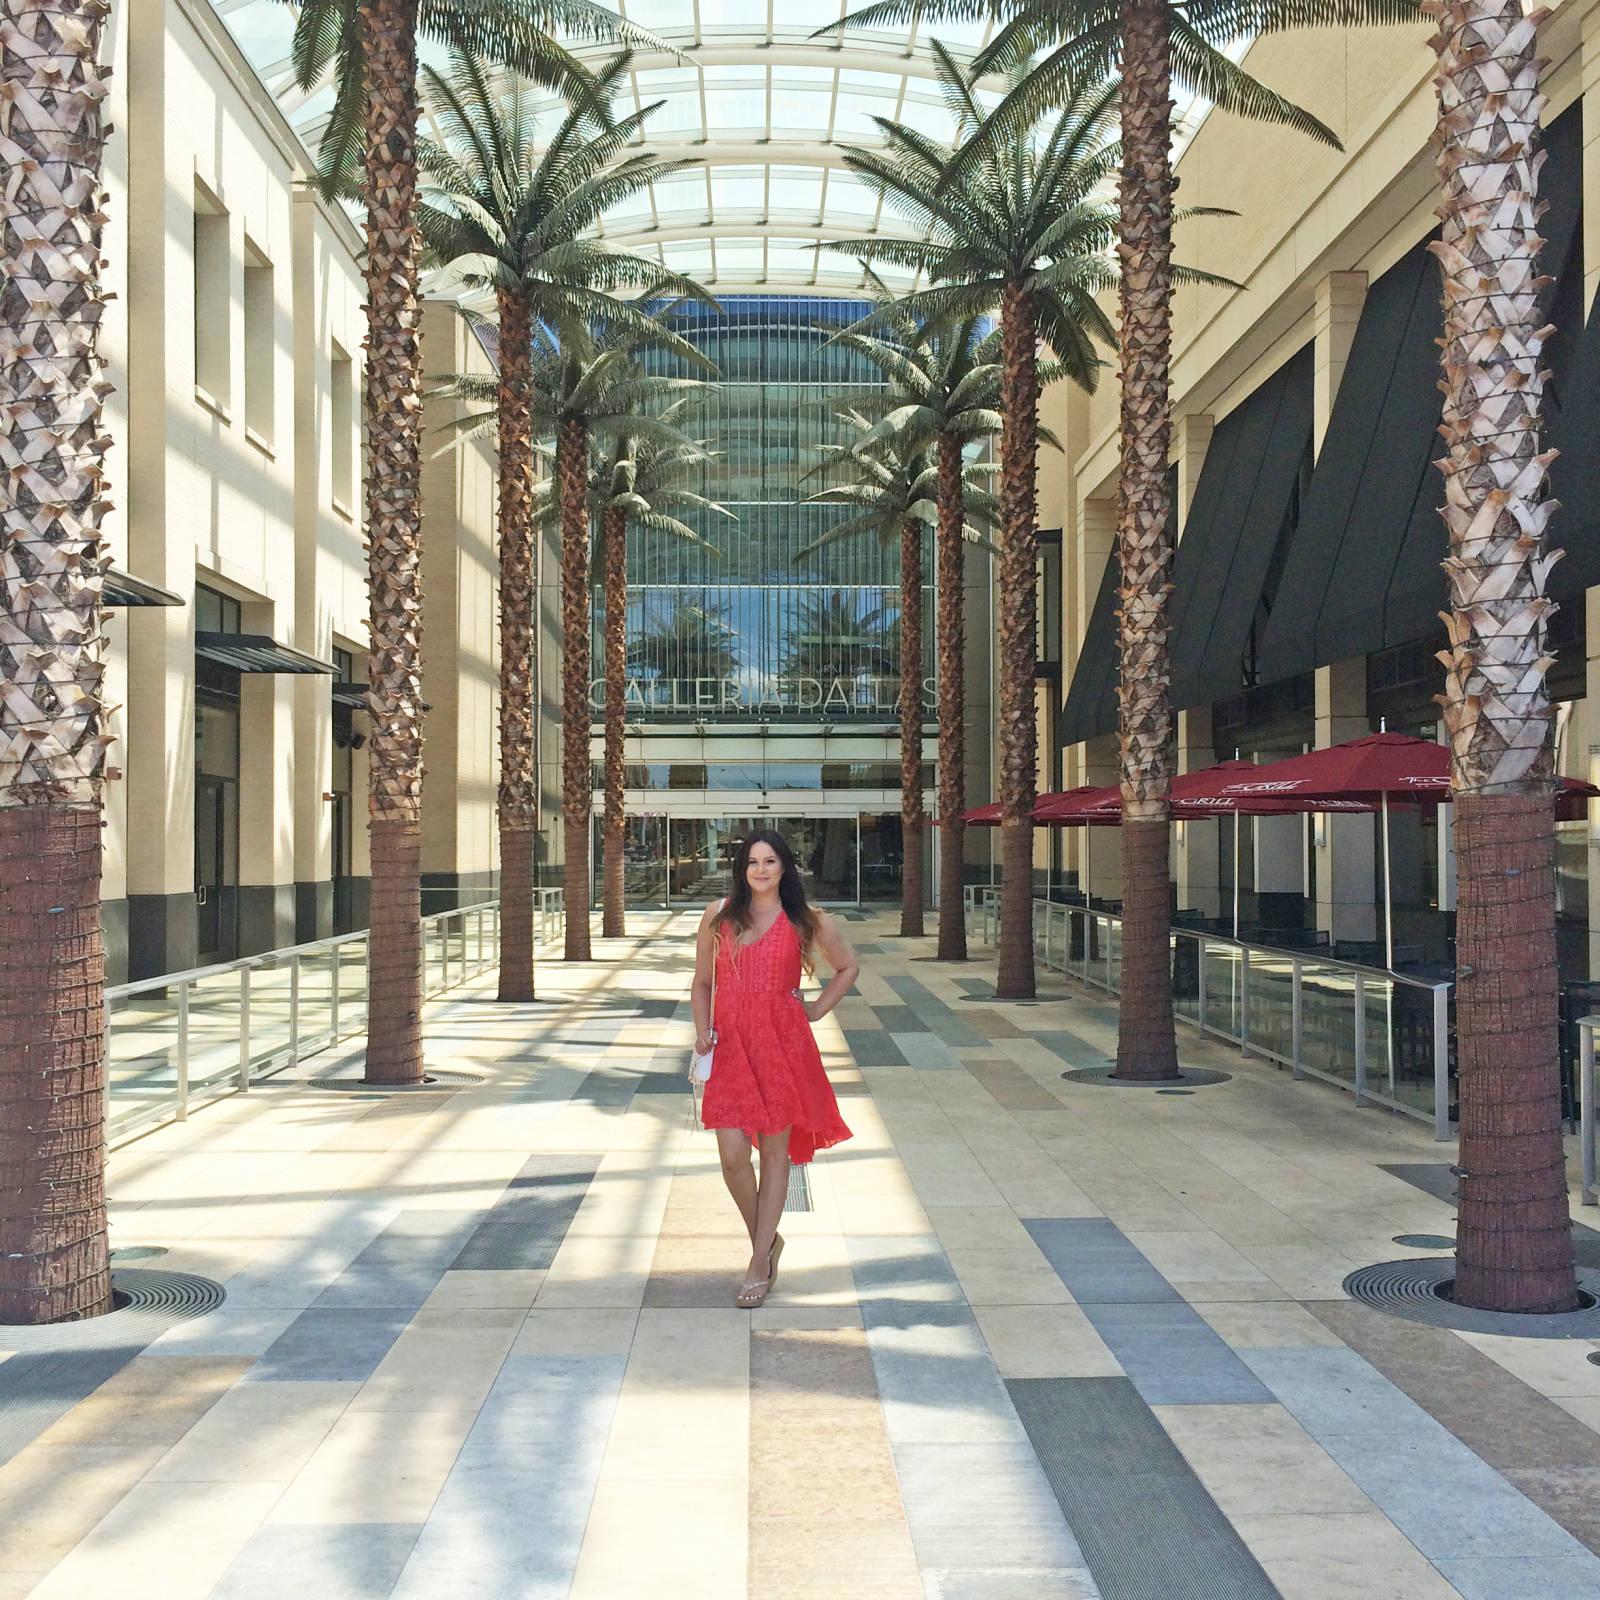 galleria-mall-best-shopping-malls-in-dallas